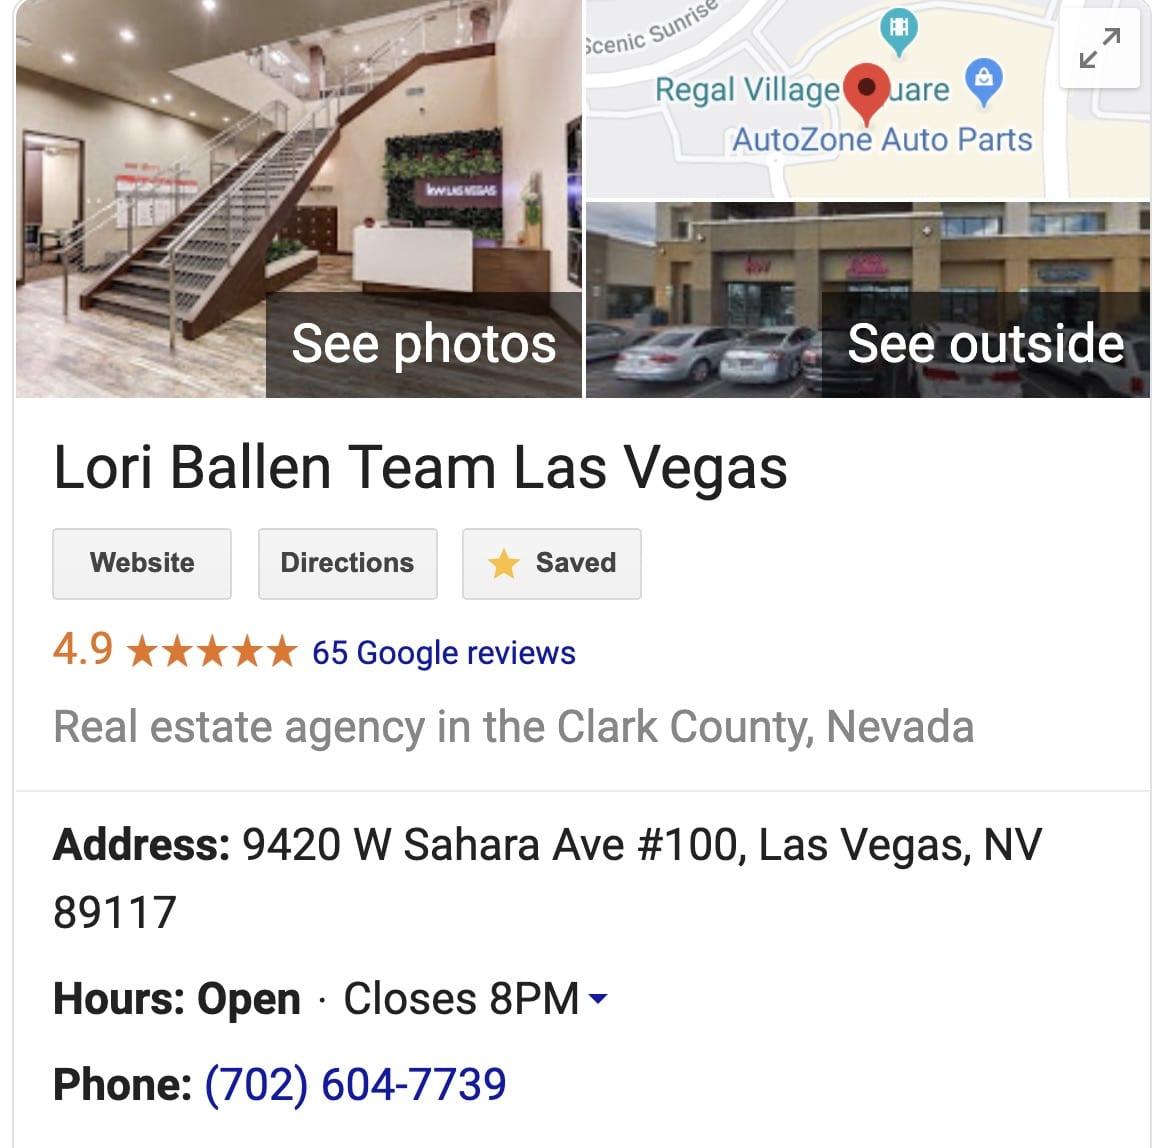 Lori Ballen Team Las Vegas GMB listing